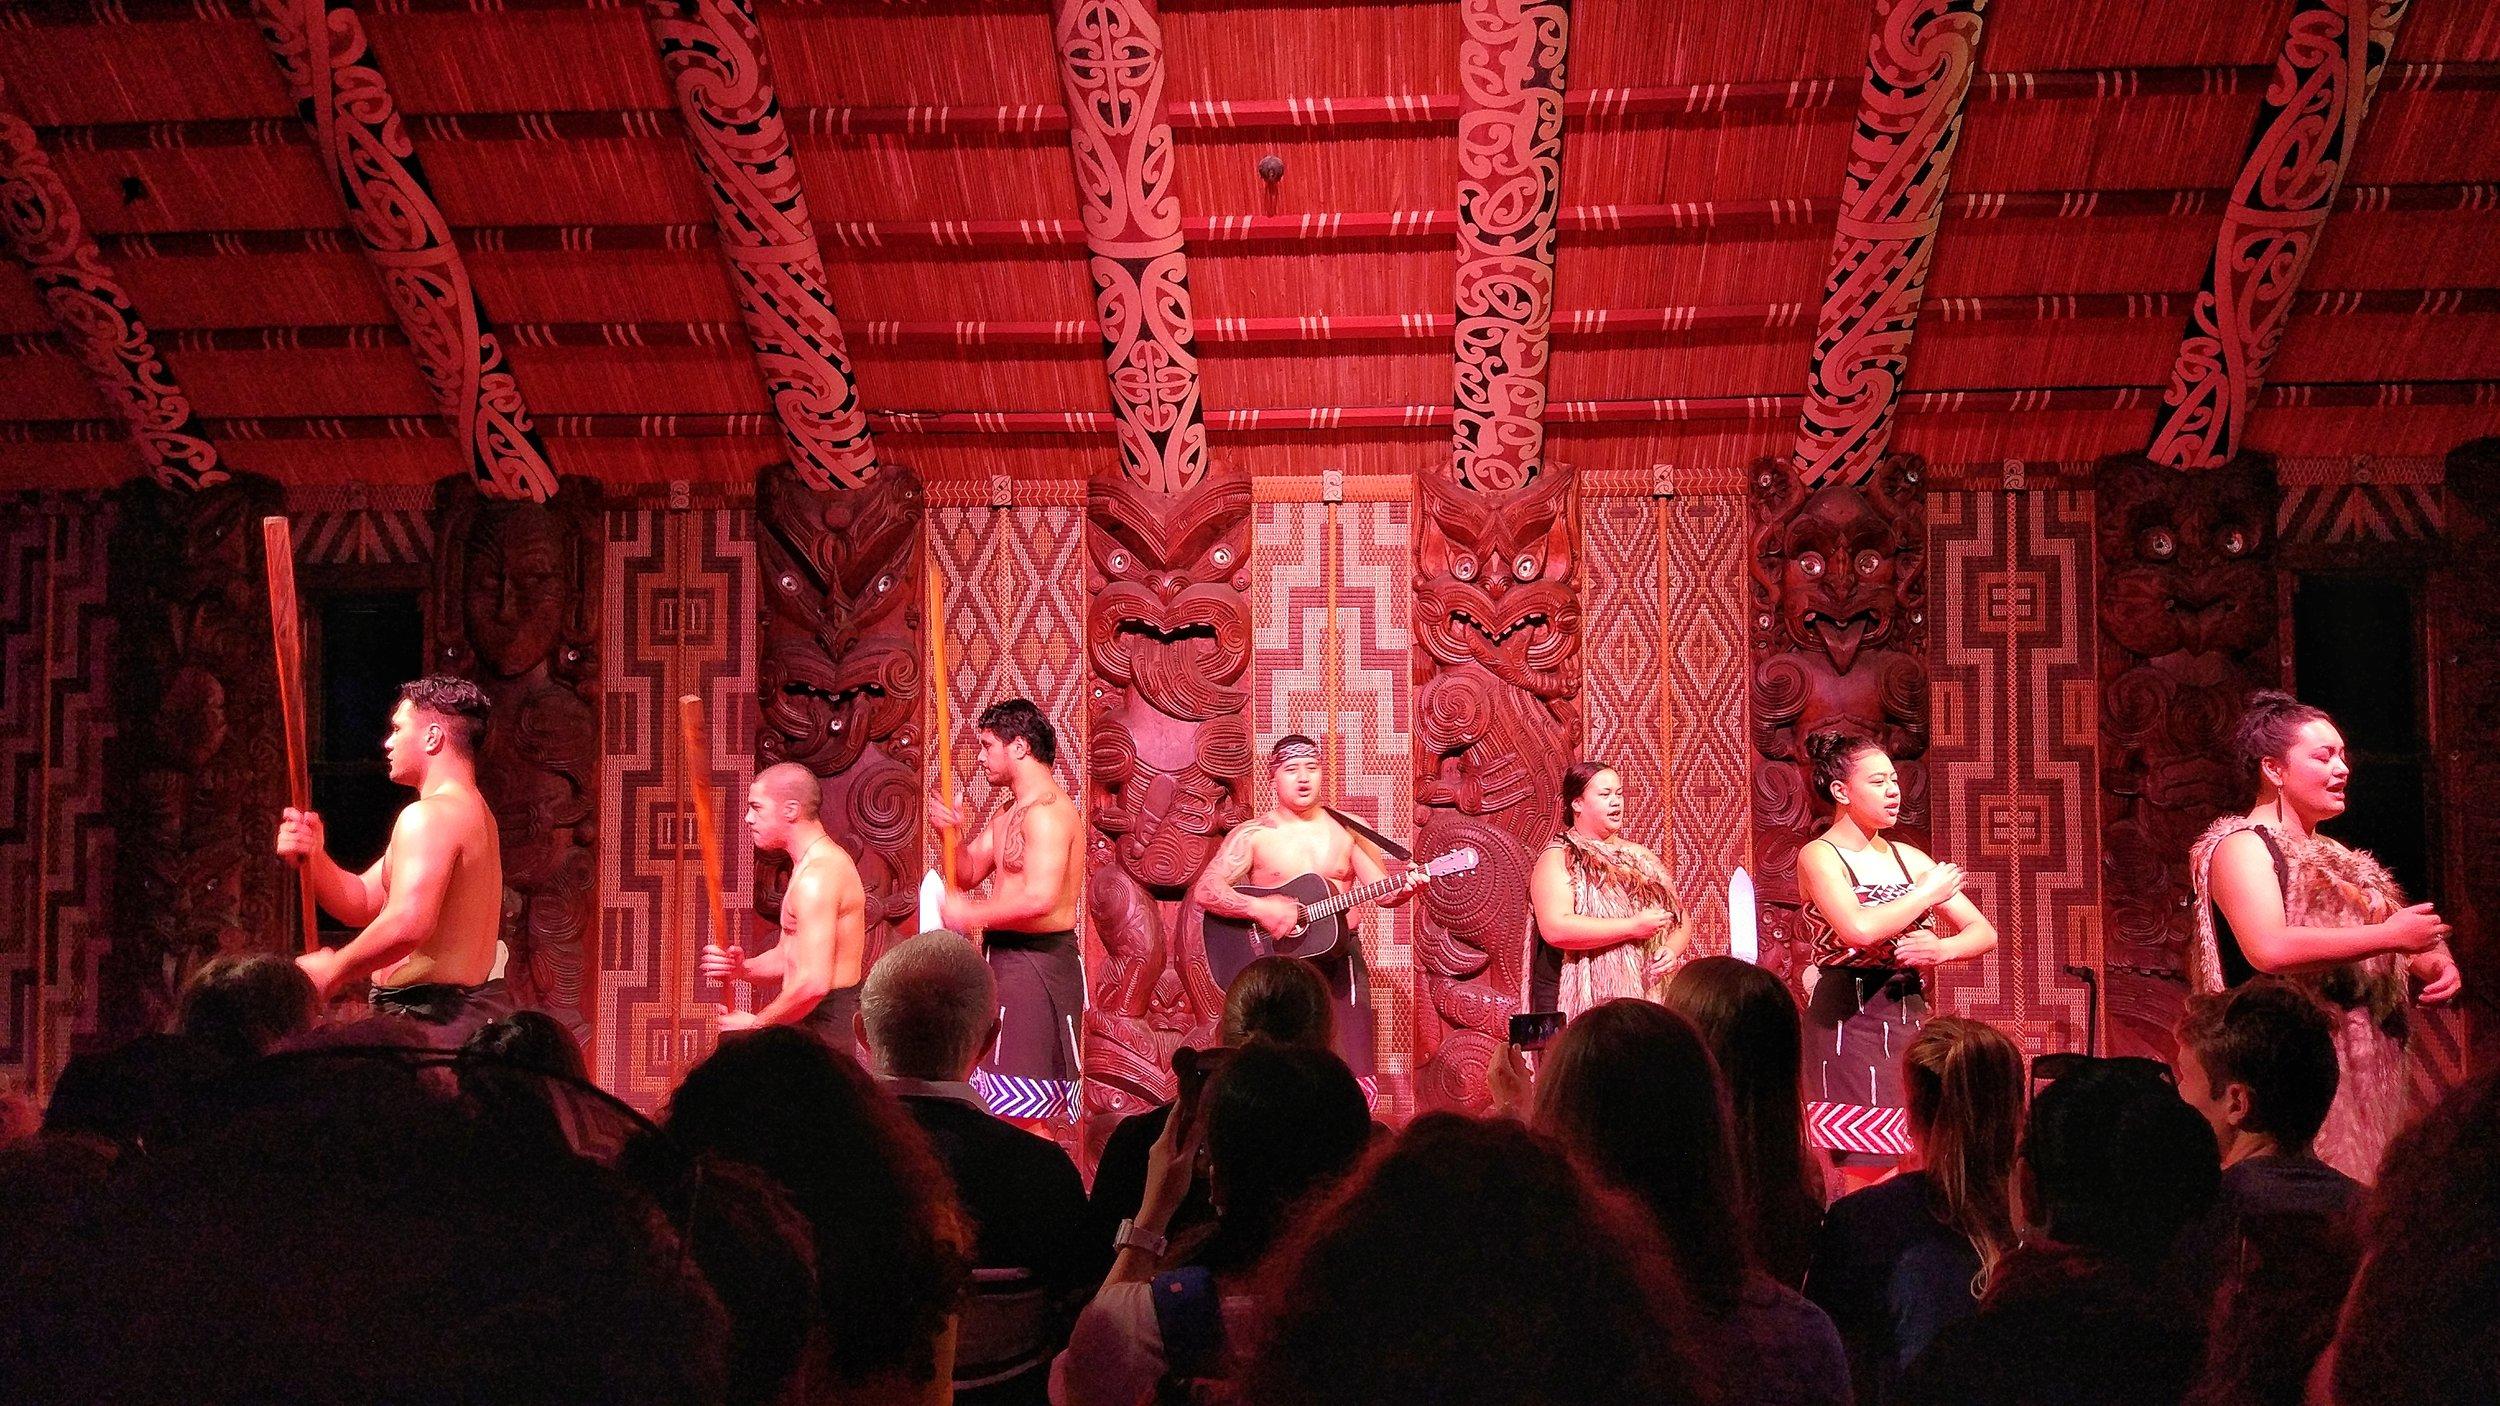 Maori cultural show at the Waitangi Treaty Grounds, Bay of Islands